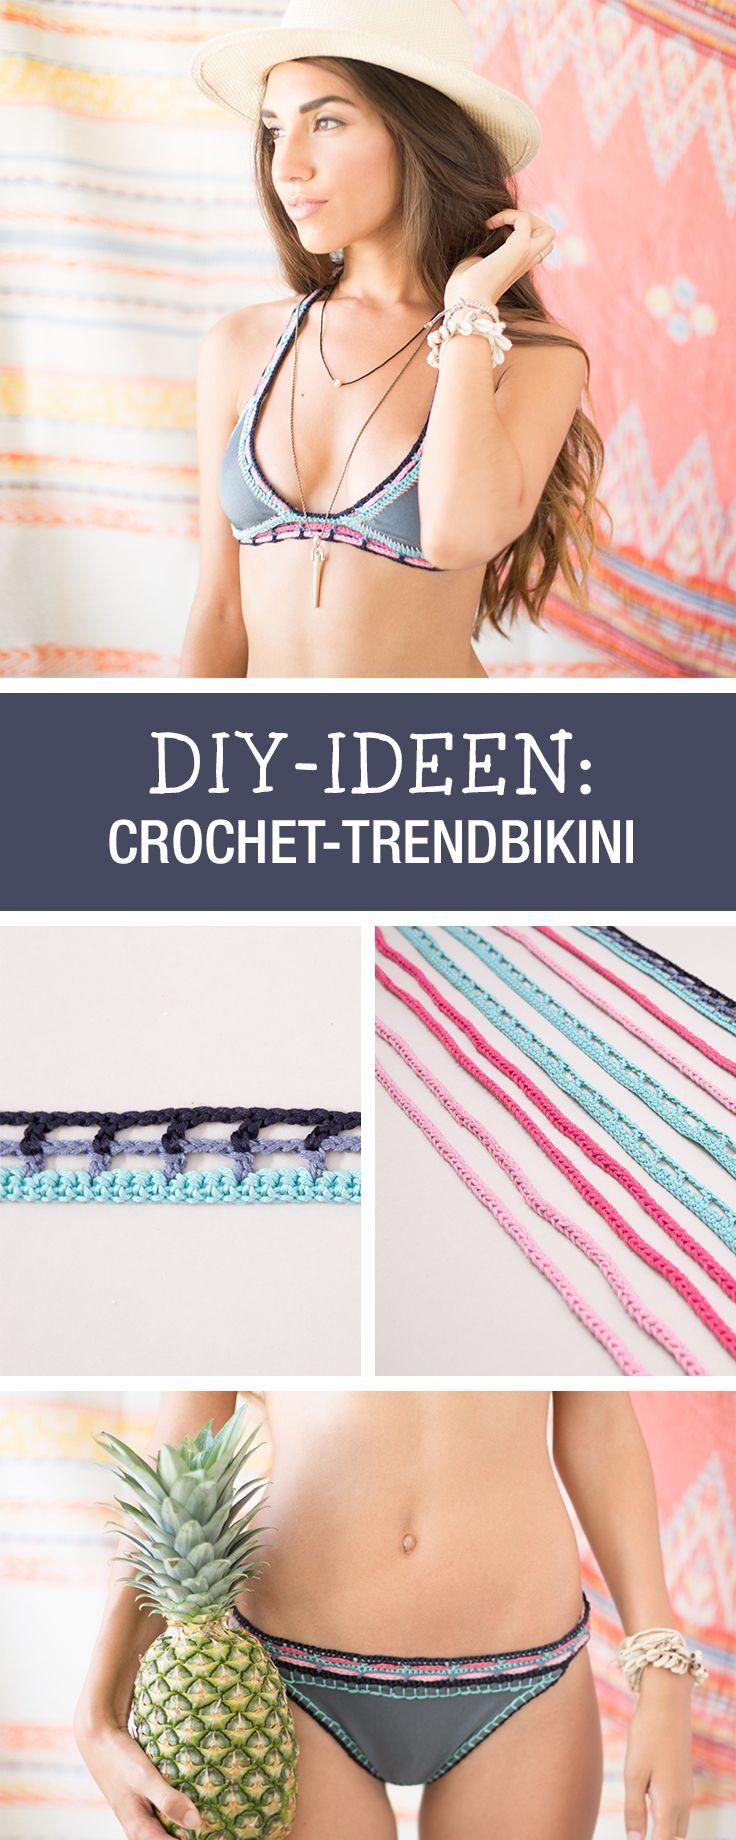 Im Trend: Anleitung für einen Crochet-Bikini mit Häkelleiste, Boho Stil / how to crochet your own boho bikini via DaWanda.com